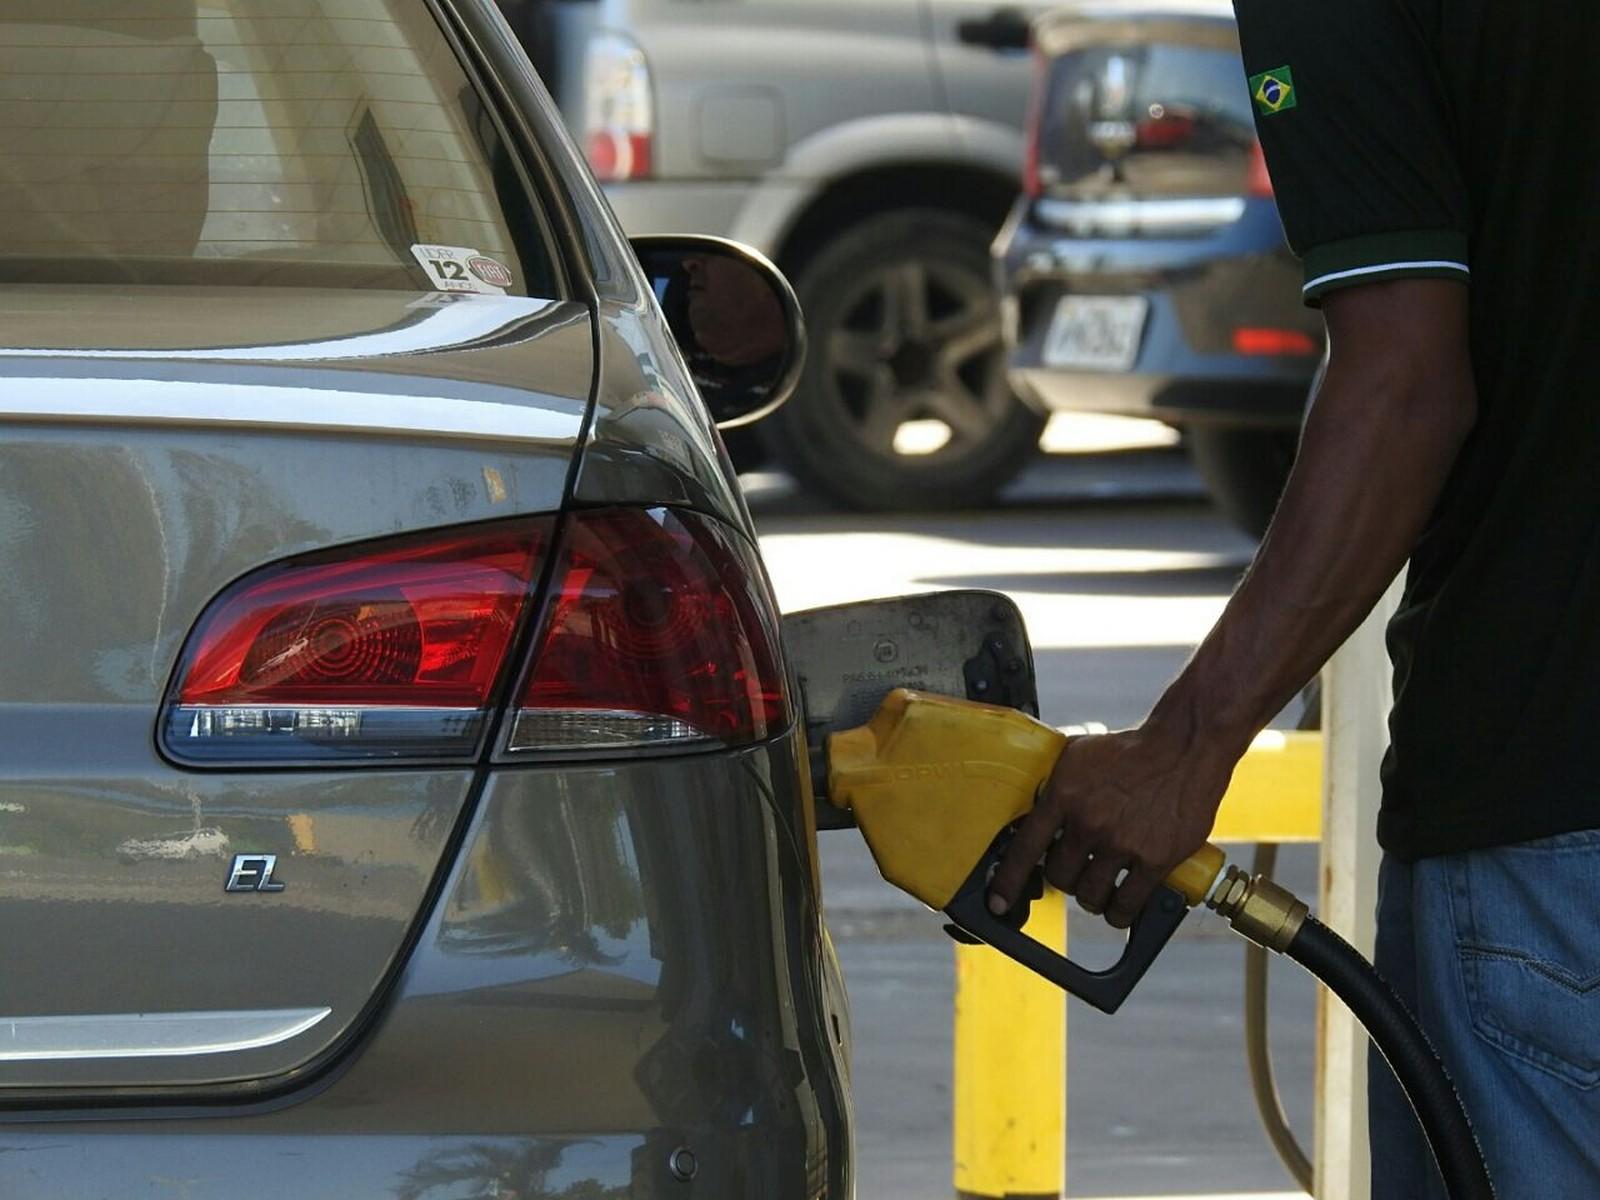 ANP disponibiliza sistema de consulta de preços informados pelos postos de combustíveis